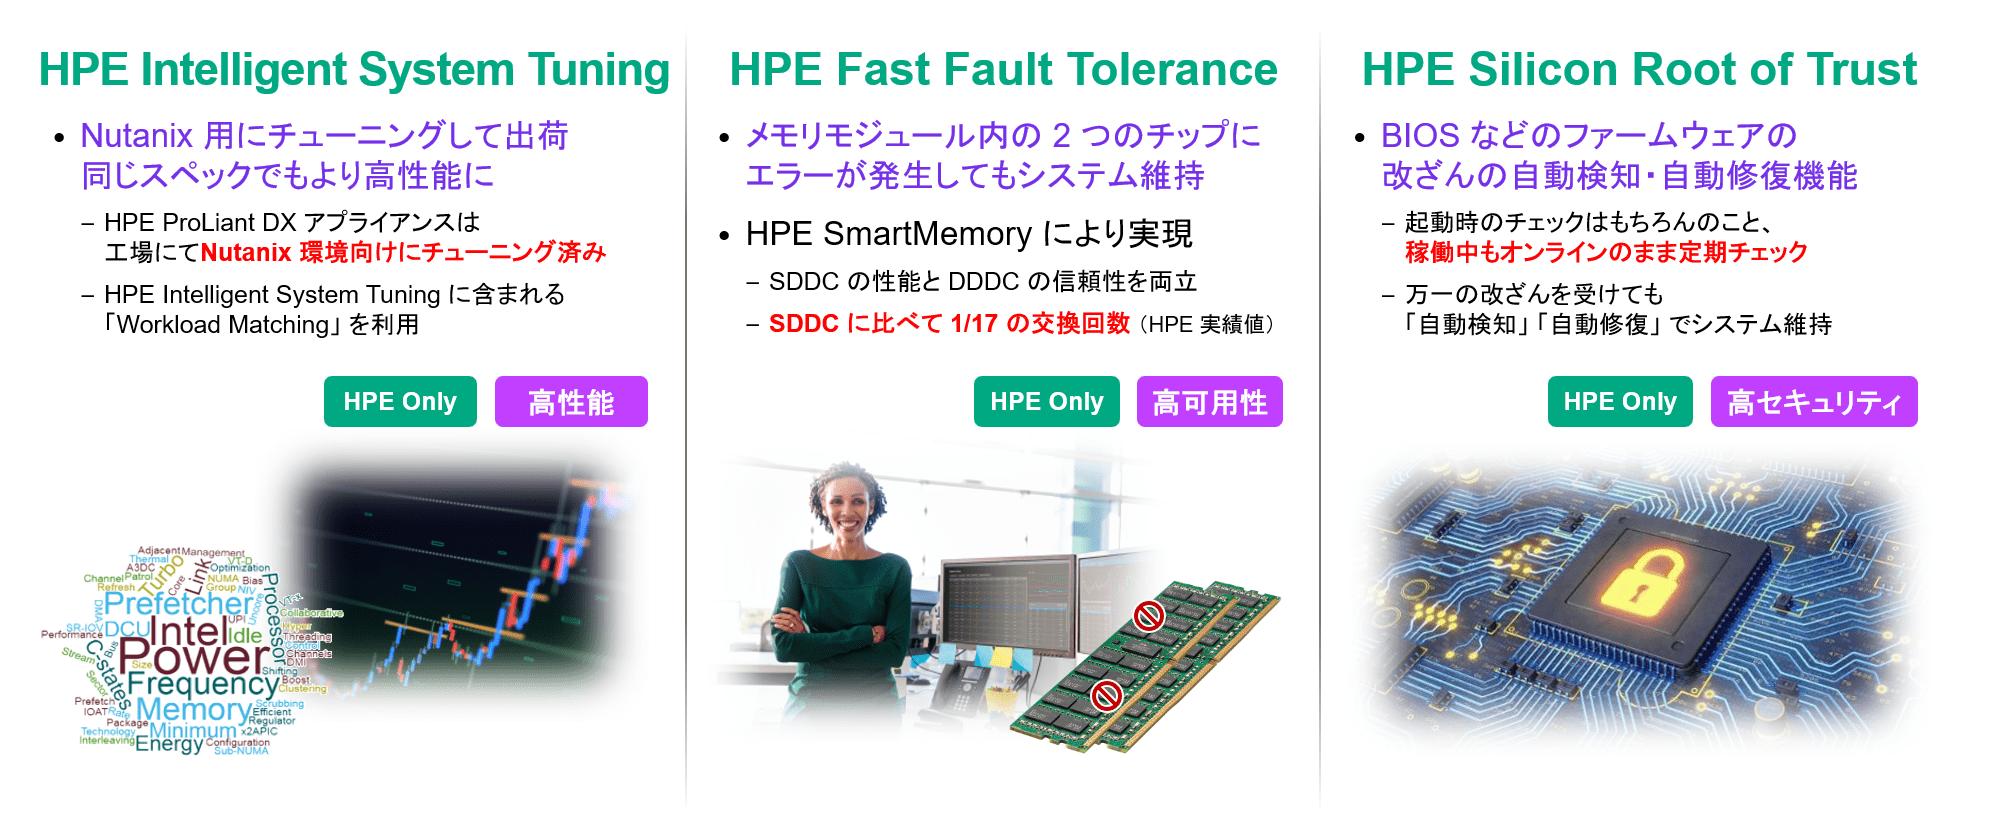 Nutanix_HPE_独自技術で、あんしん・安定稼働